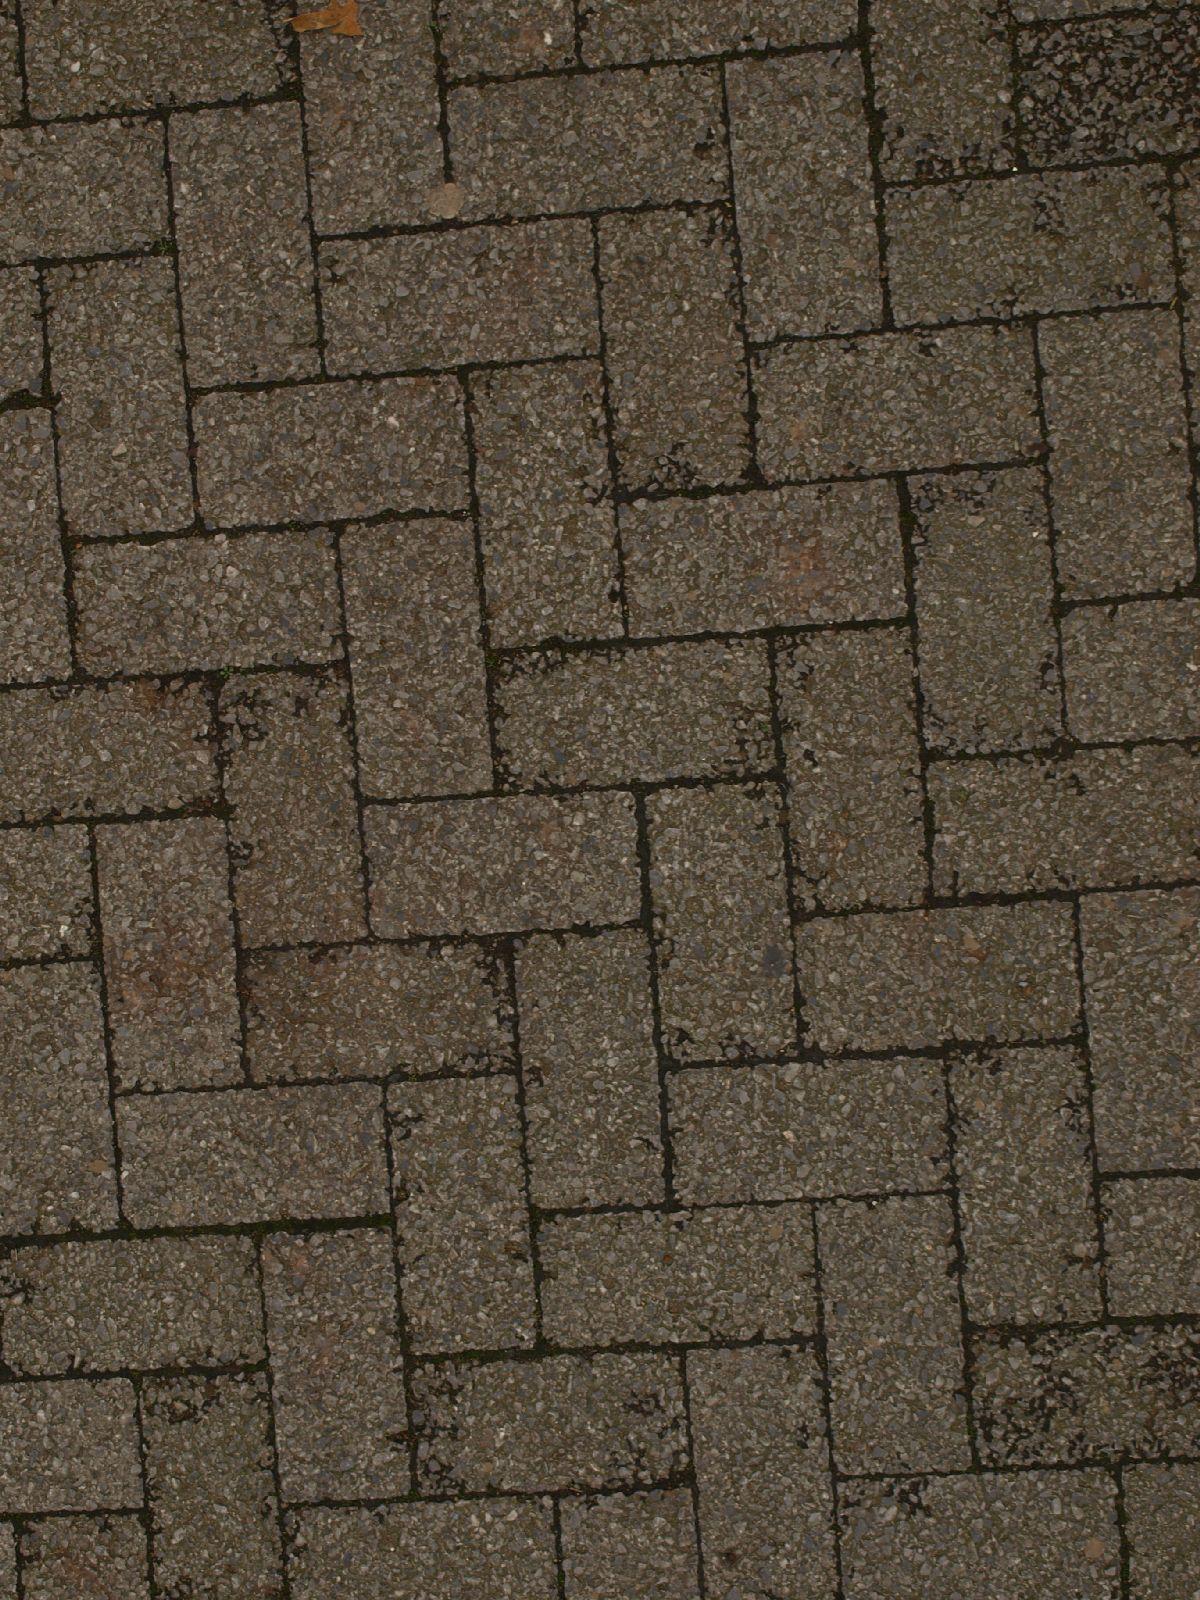 Boden-Gehweg-Strasse-Buergersteig-Textur_A_PA270692